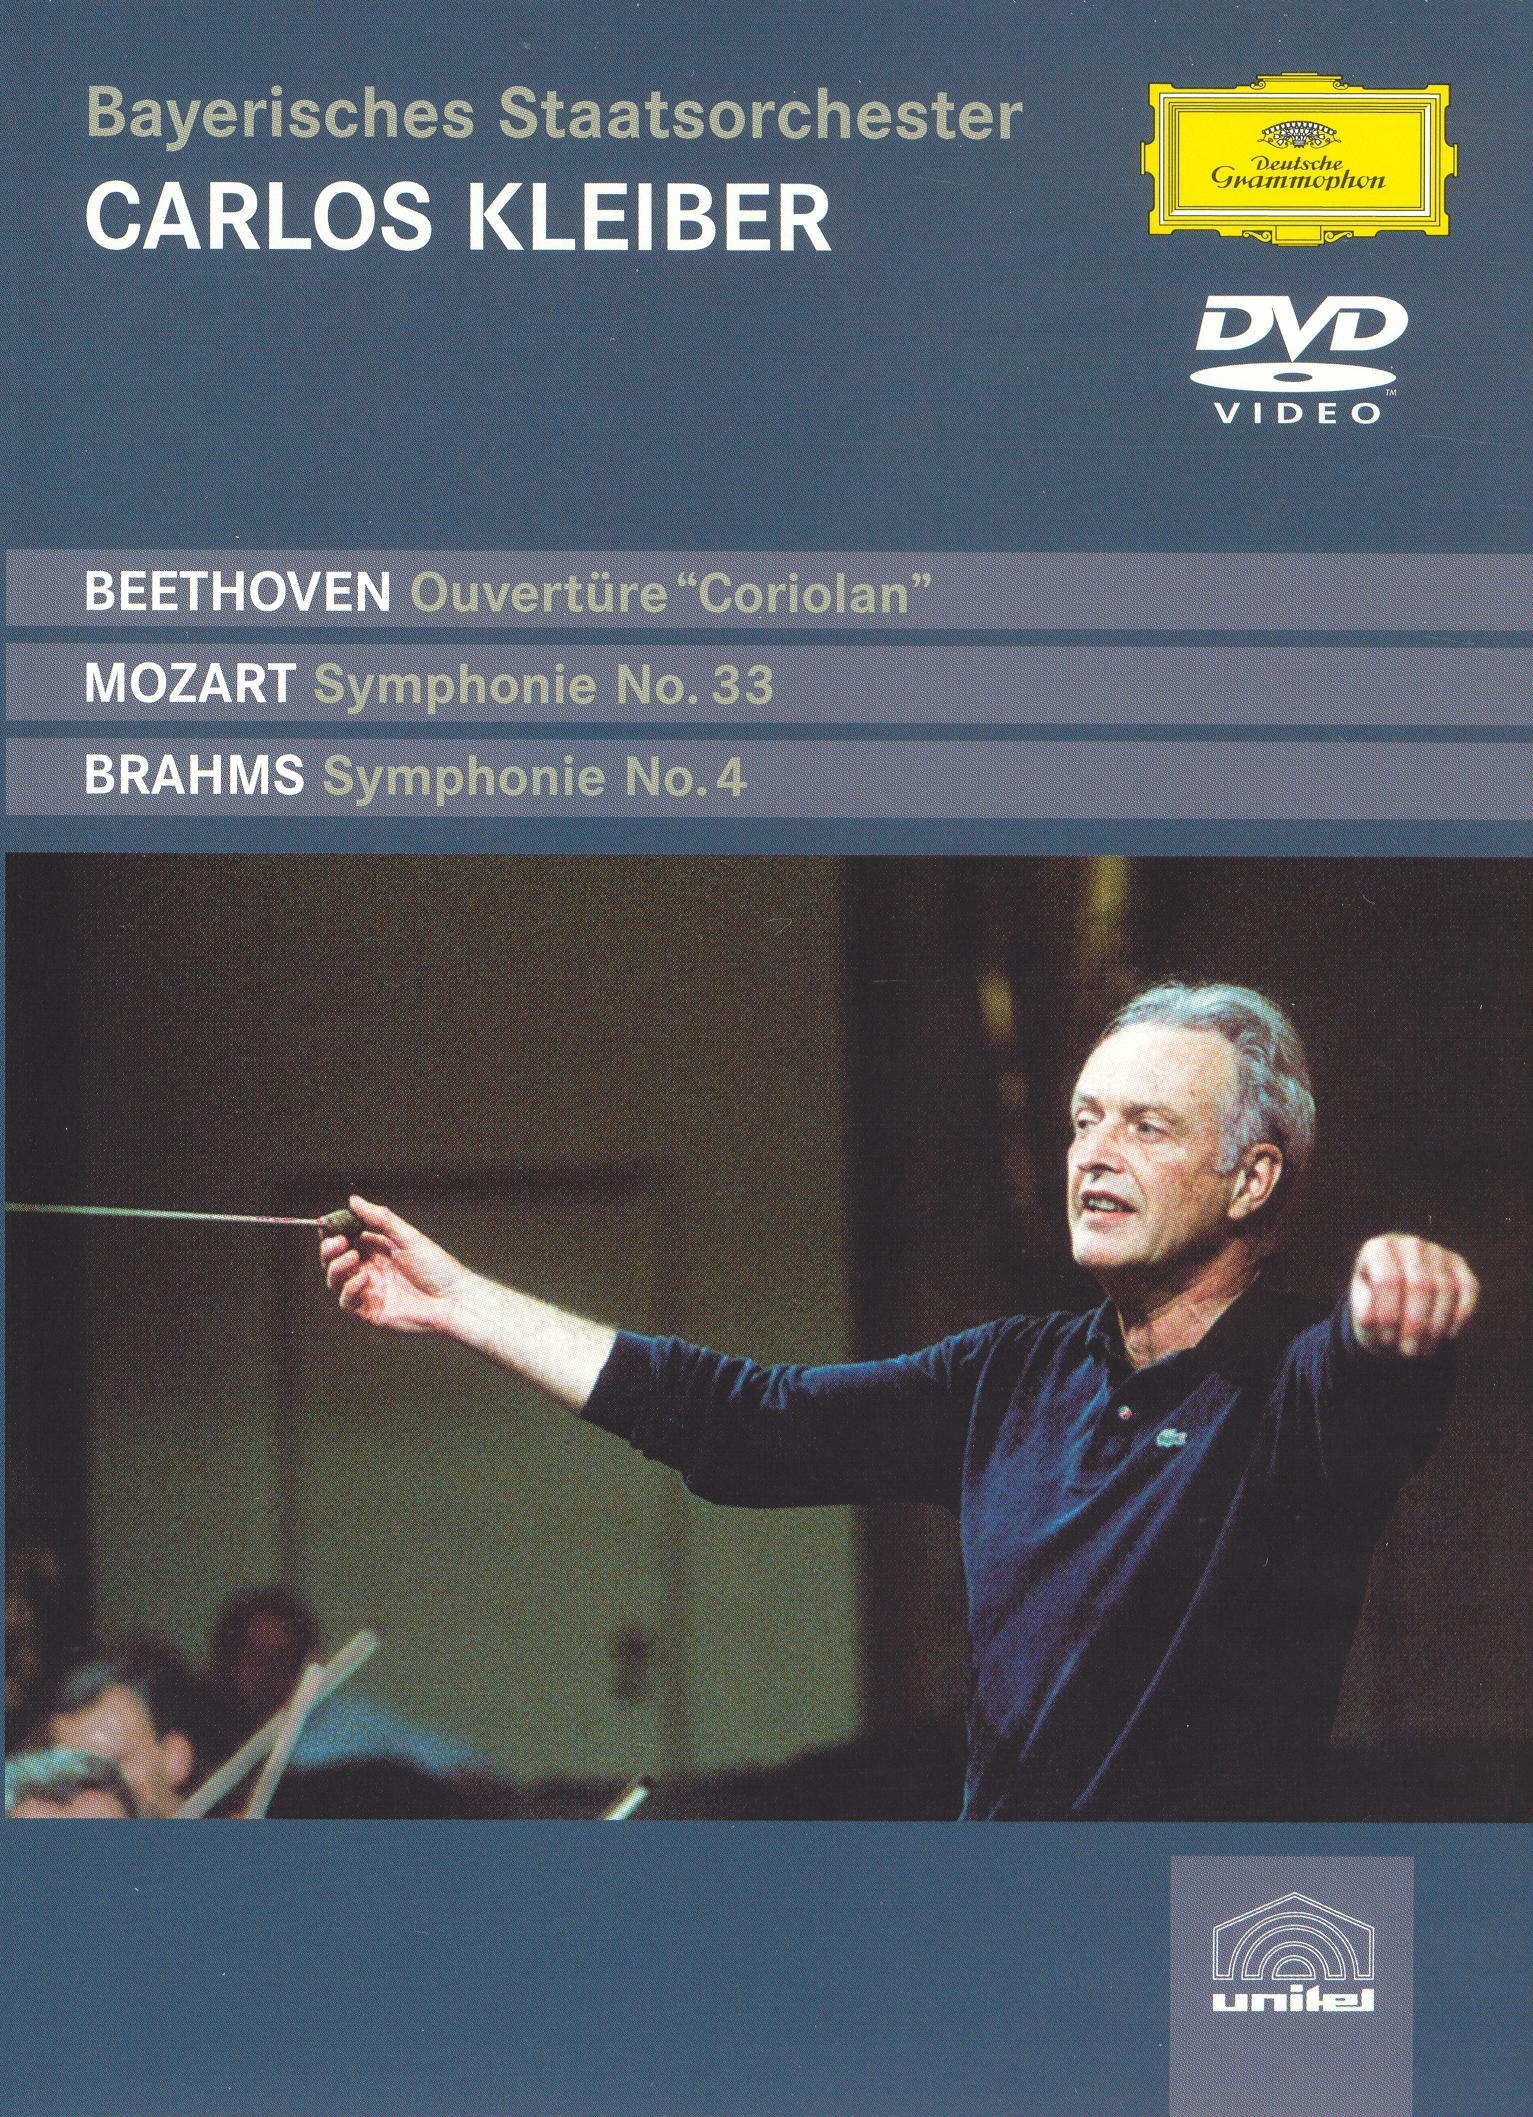 Beethoven: Ciriolan Overture/Symphony 33/Symphony 4